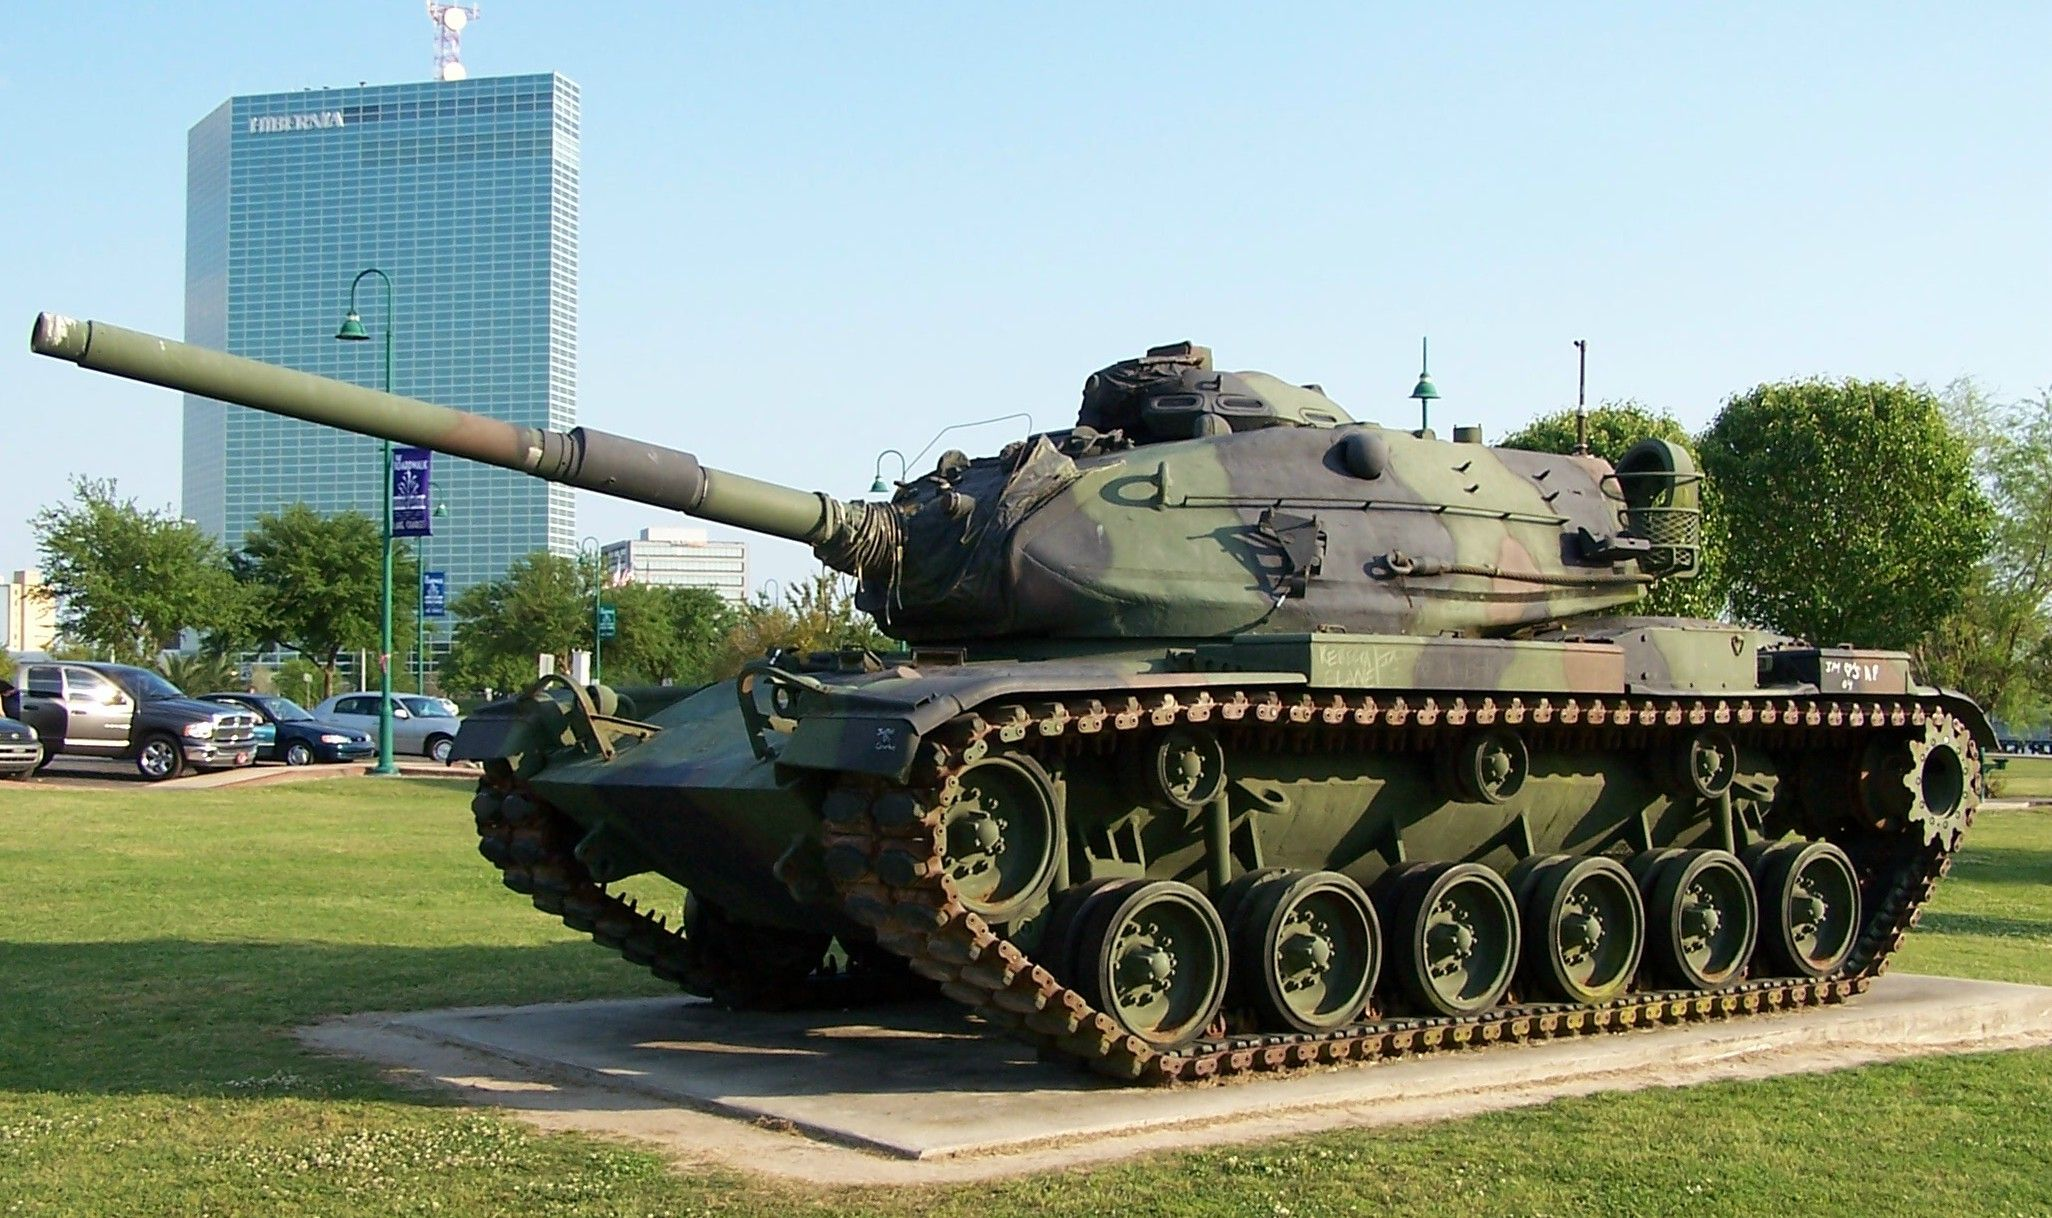 [Image: American_M60A3_tank_Lake_Charles%2C_Loui...l_2005.jpg]